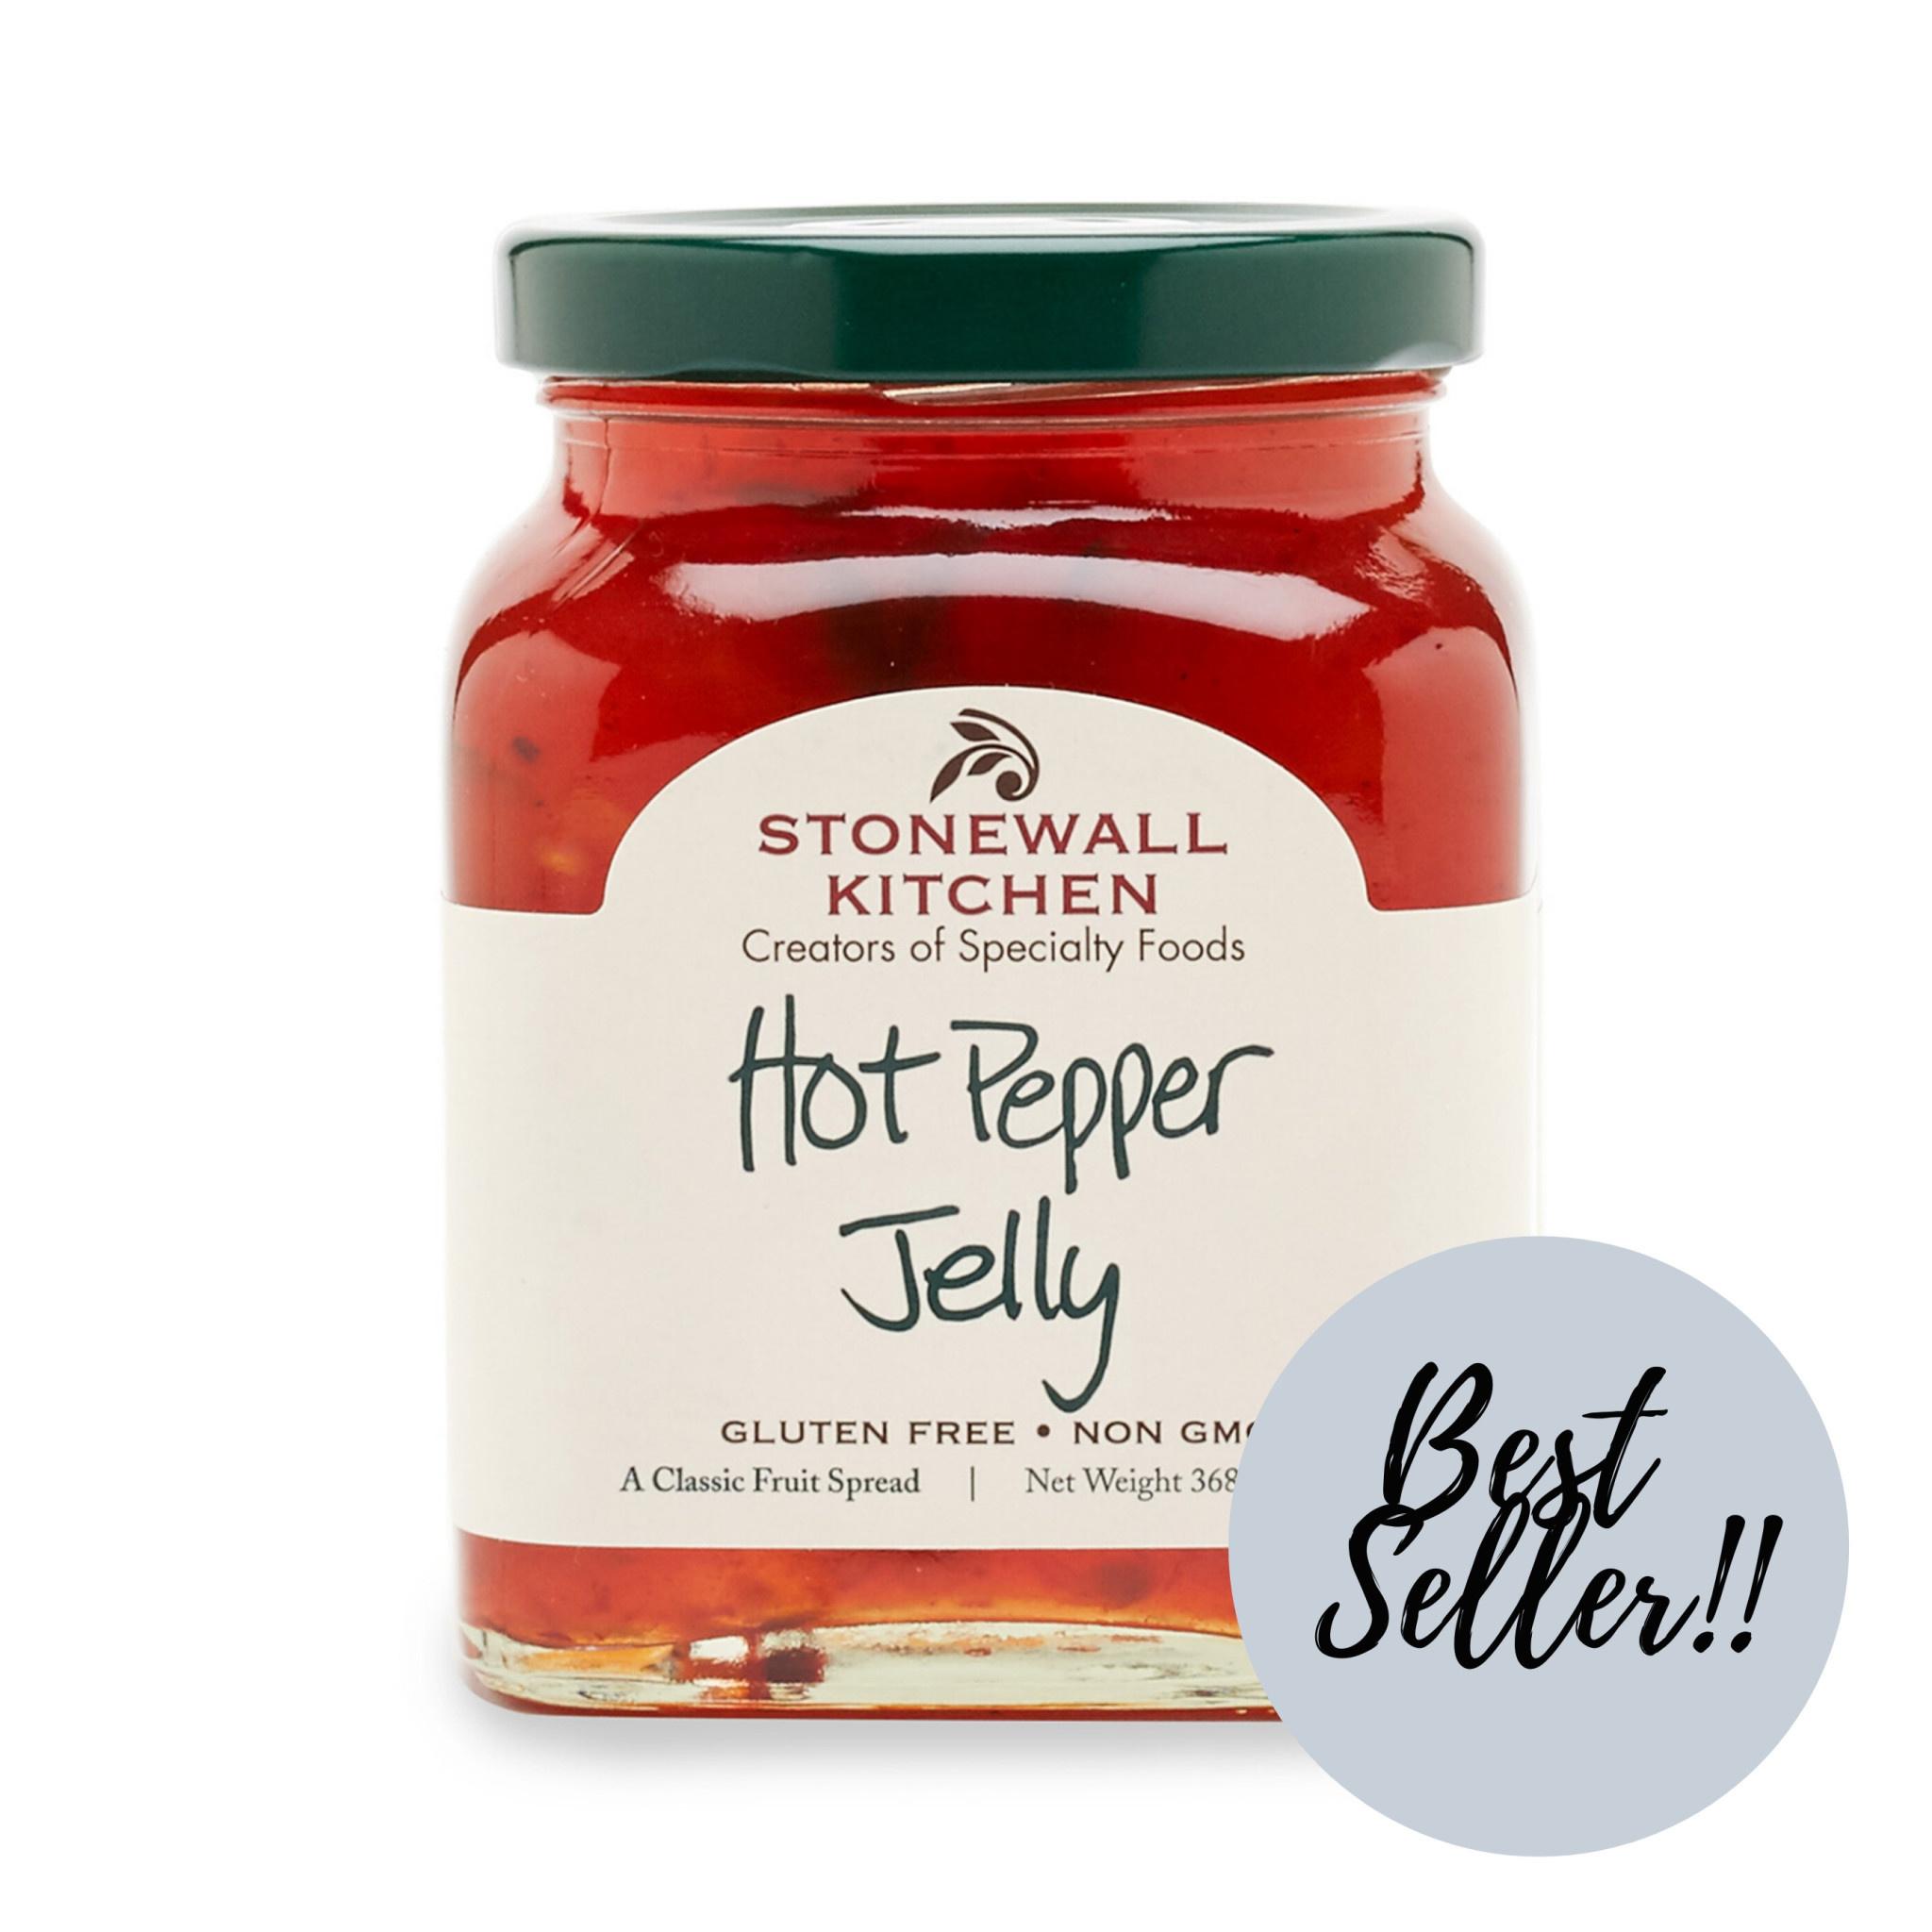 Stonewall Kitchen Jelly Hot Pepper